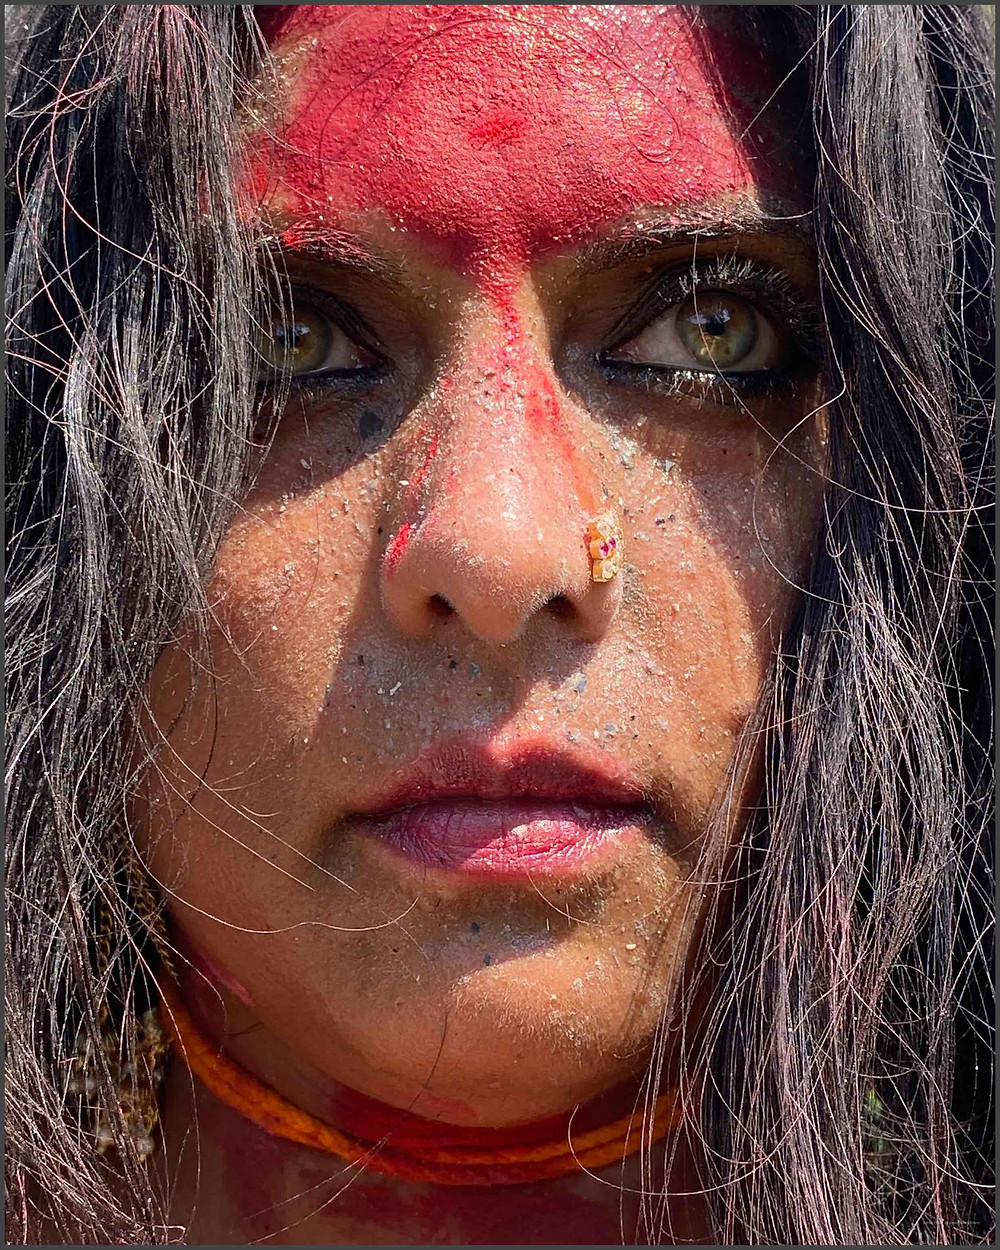 Meditate on Valli, her body, her murti, her form. Meditate on Vallli, she transcends her body, her murti, her form. Your Guruji nearby. Gurudeva Beyond. Valli of Vallimanalan forms iccha sakti. Valli of Vallimanalan transcends iccha sakti.      Aum Sundaram Aumkaar Sundaram  |  Photographer: Alexa Rush on Instagram @alexadrawaflower